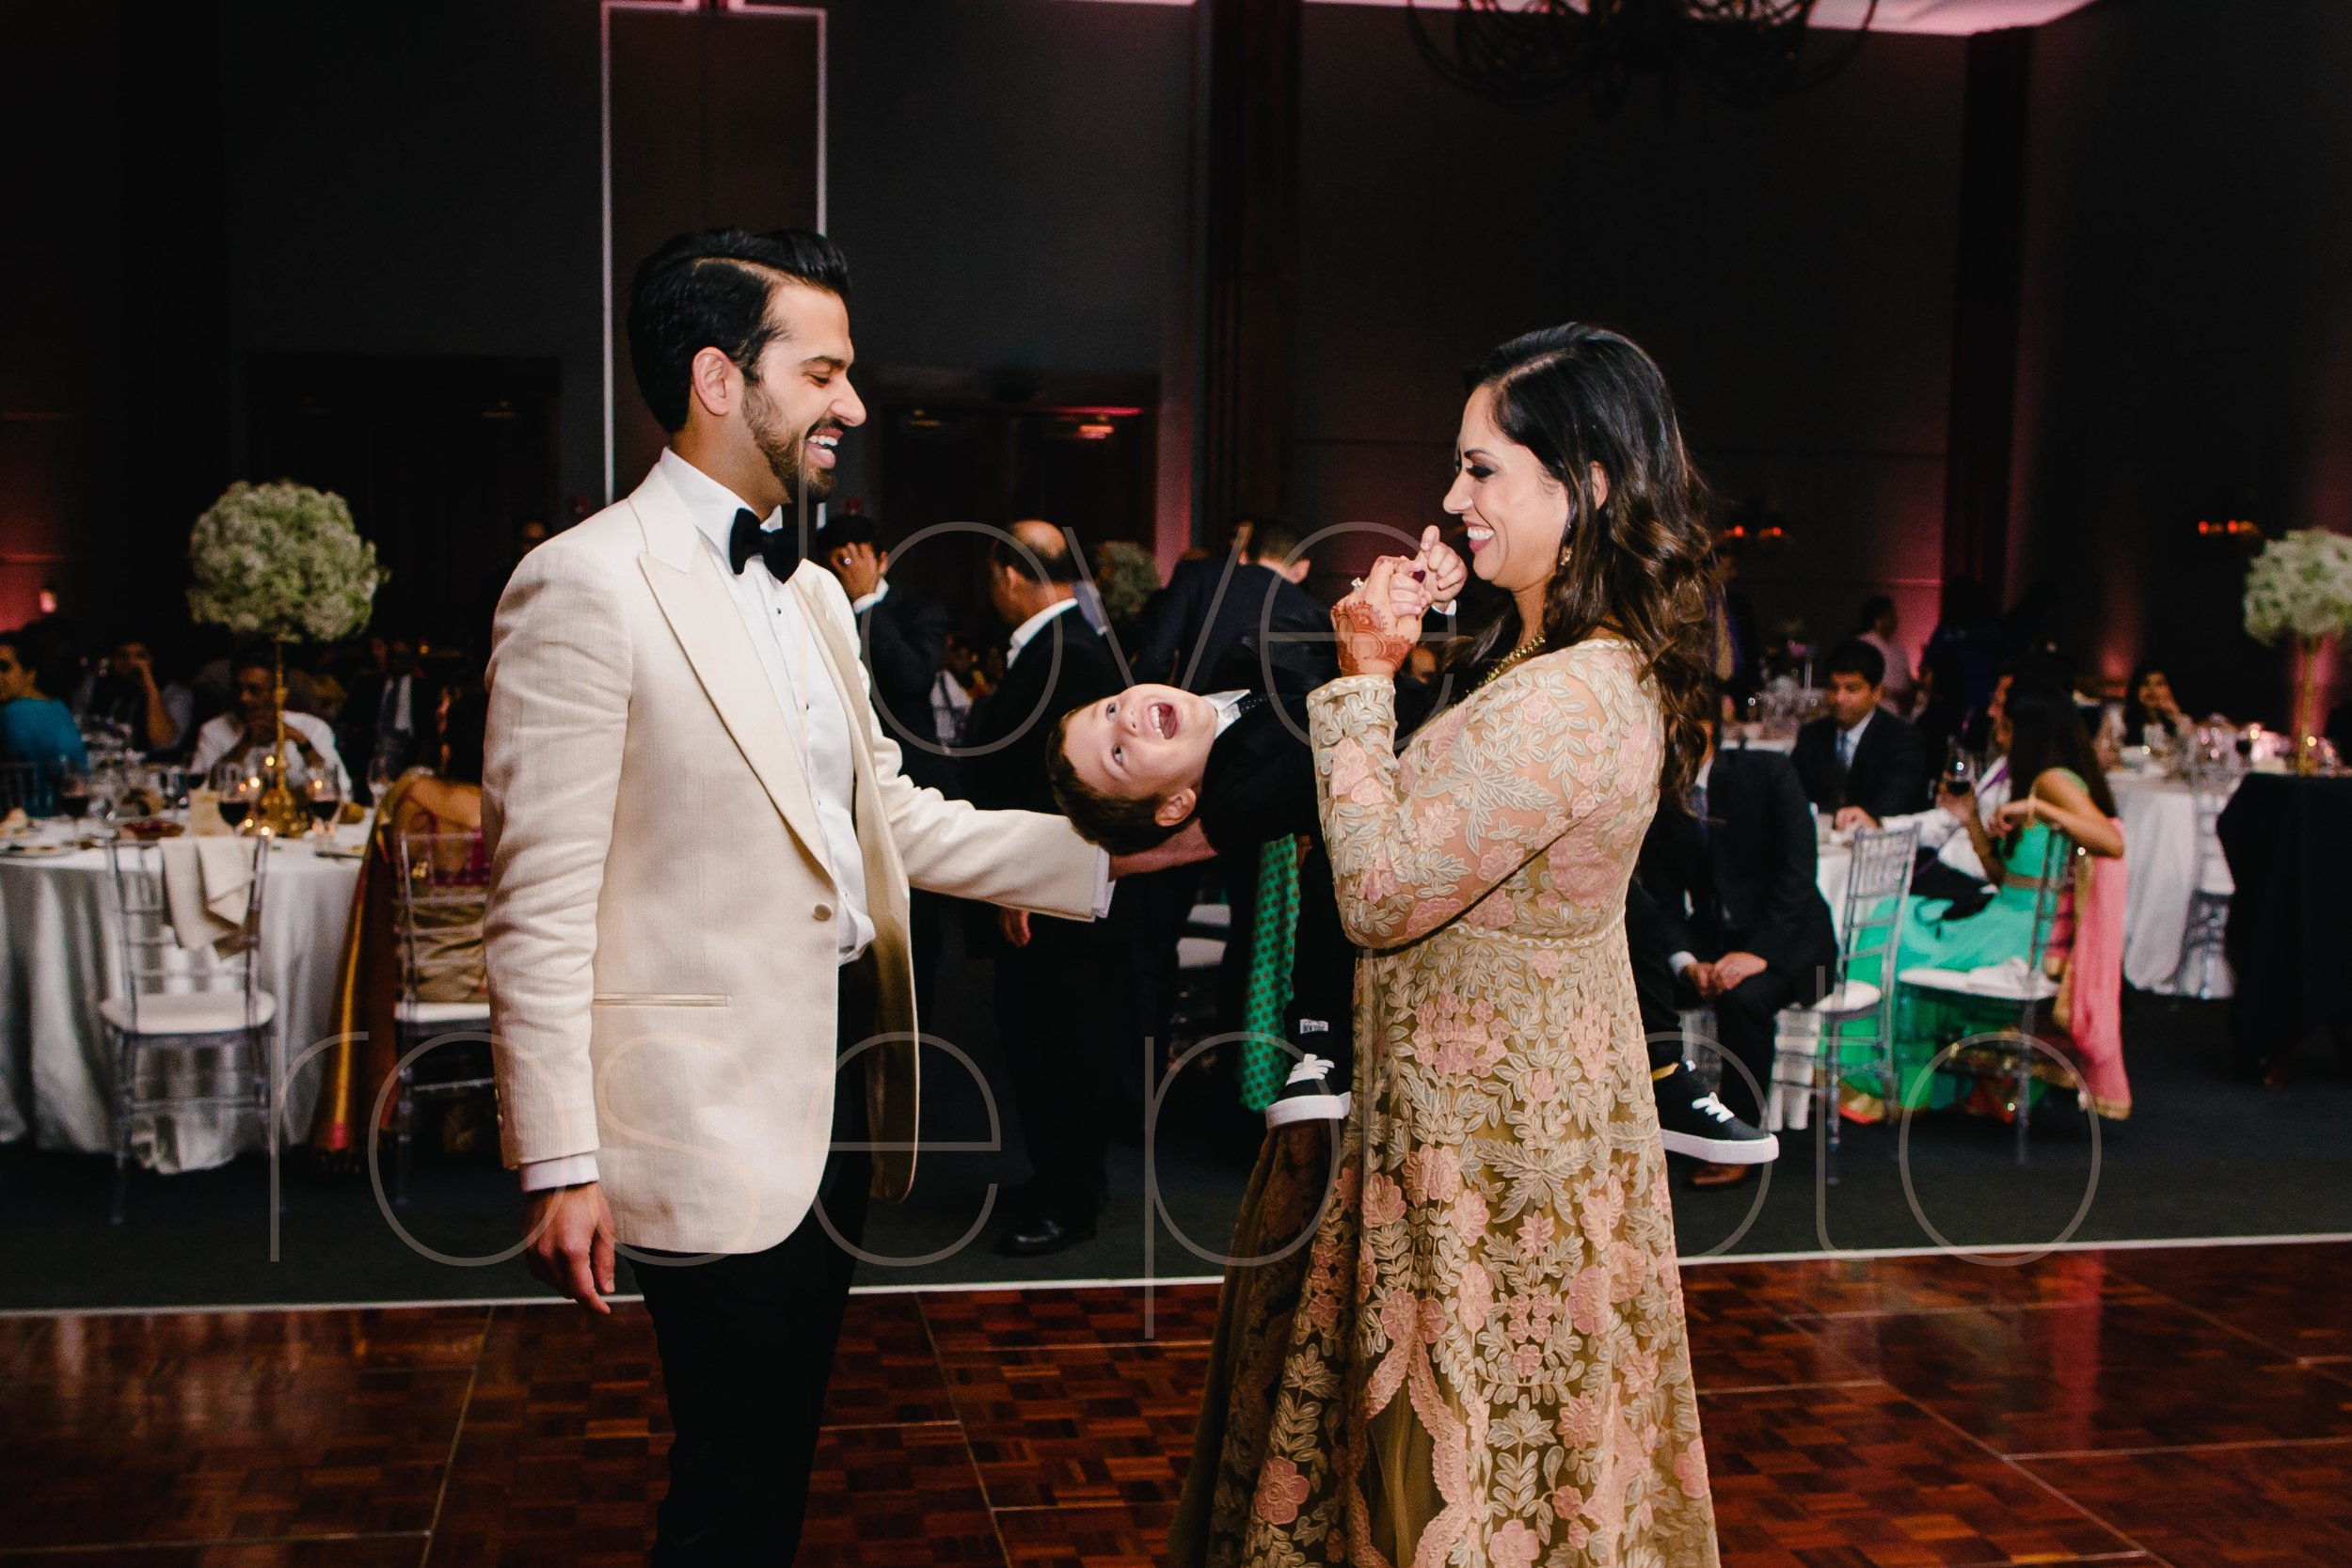 Chicago Indian Wedding best photography lifestyle wedding portrait luxury wedding-74.jpg